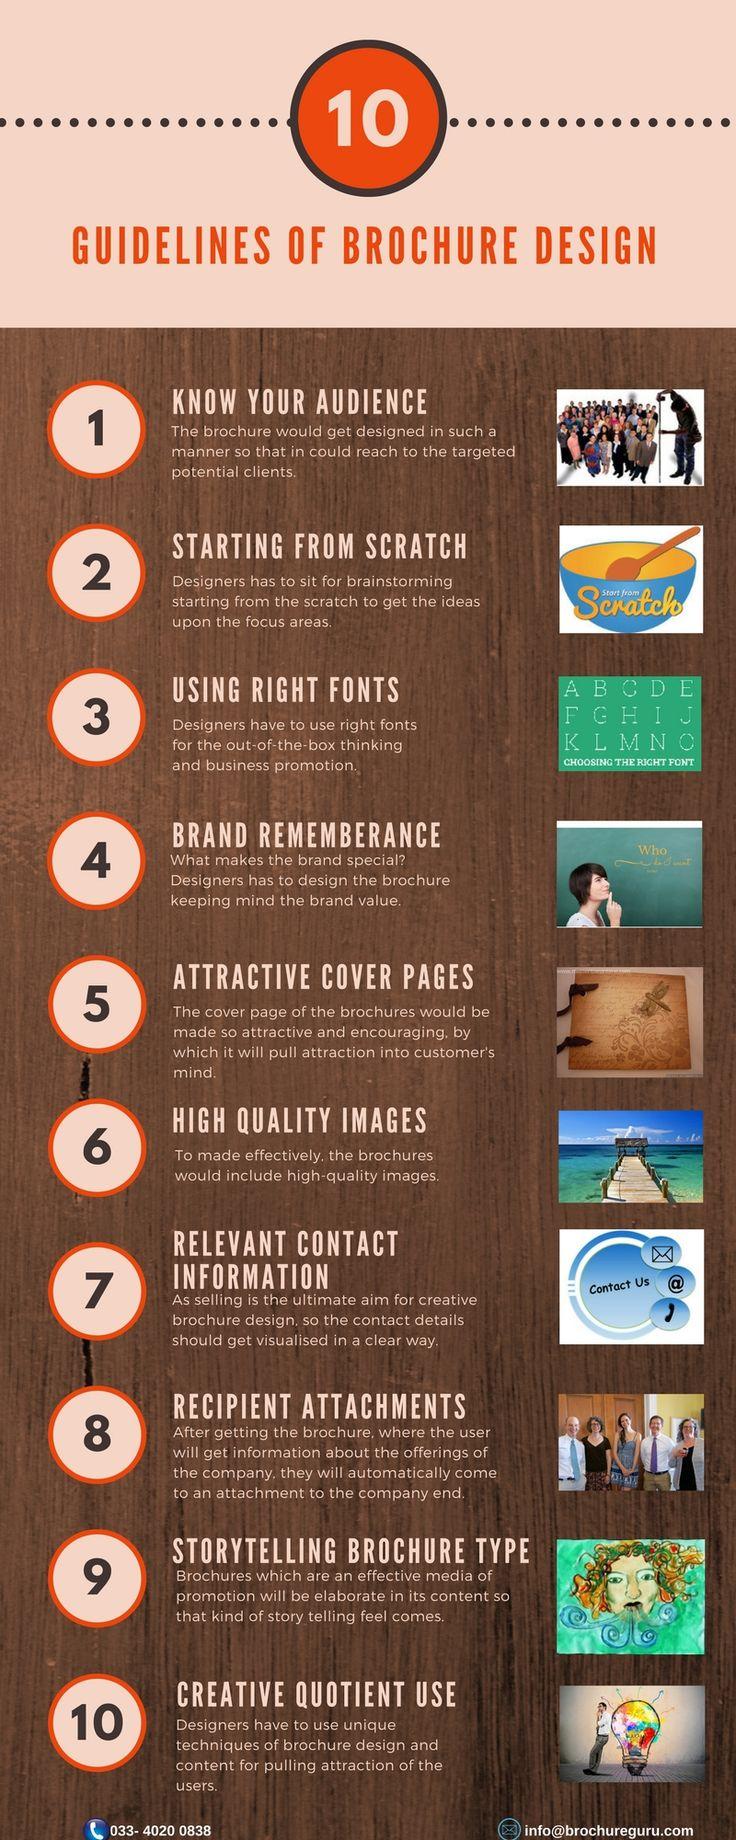 Best Brochure Design Images On   Brochures Company